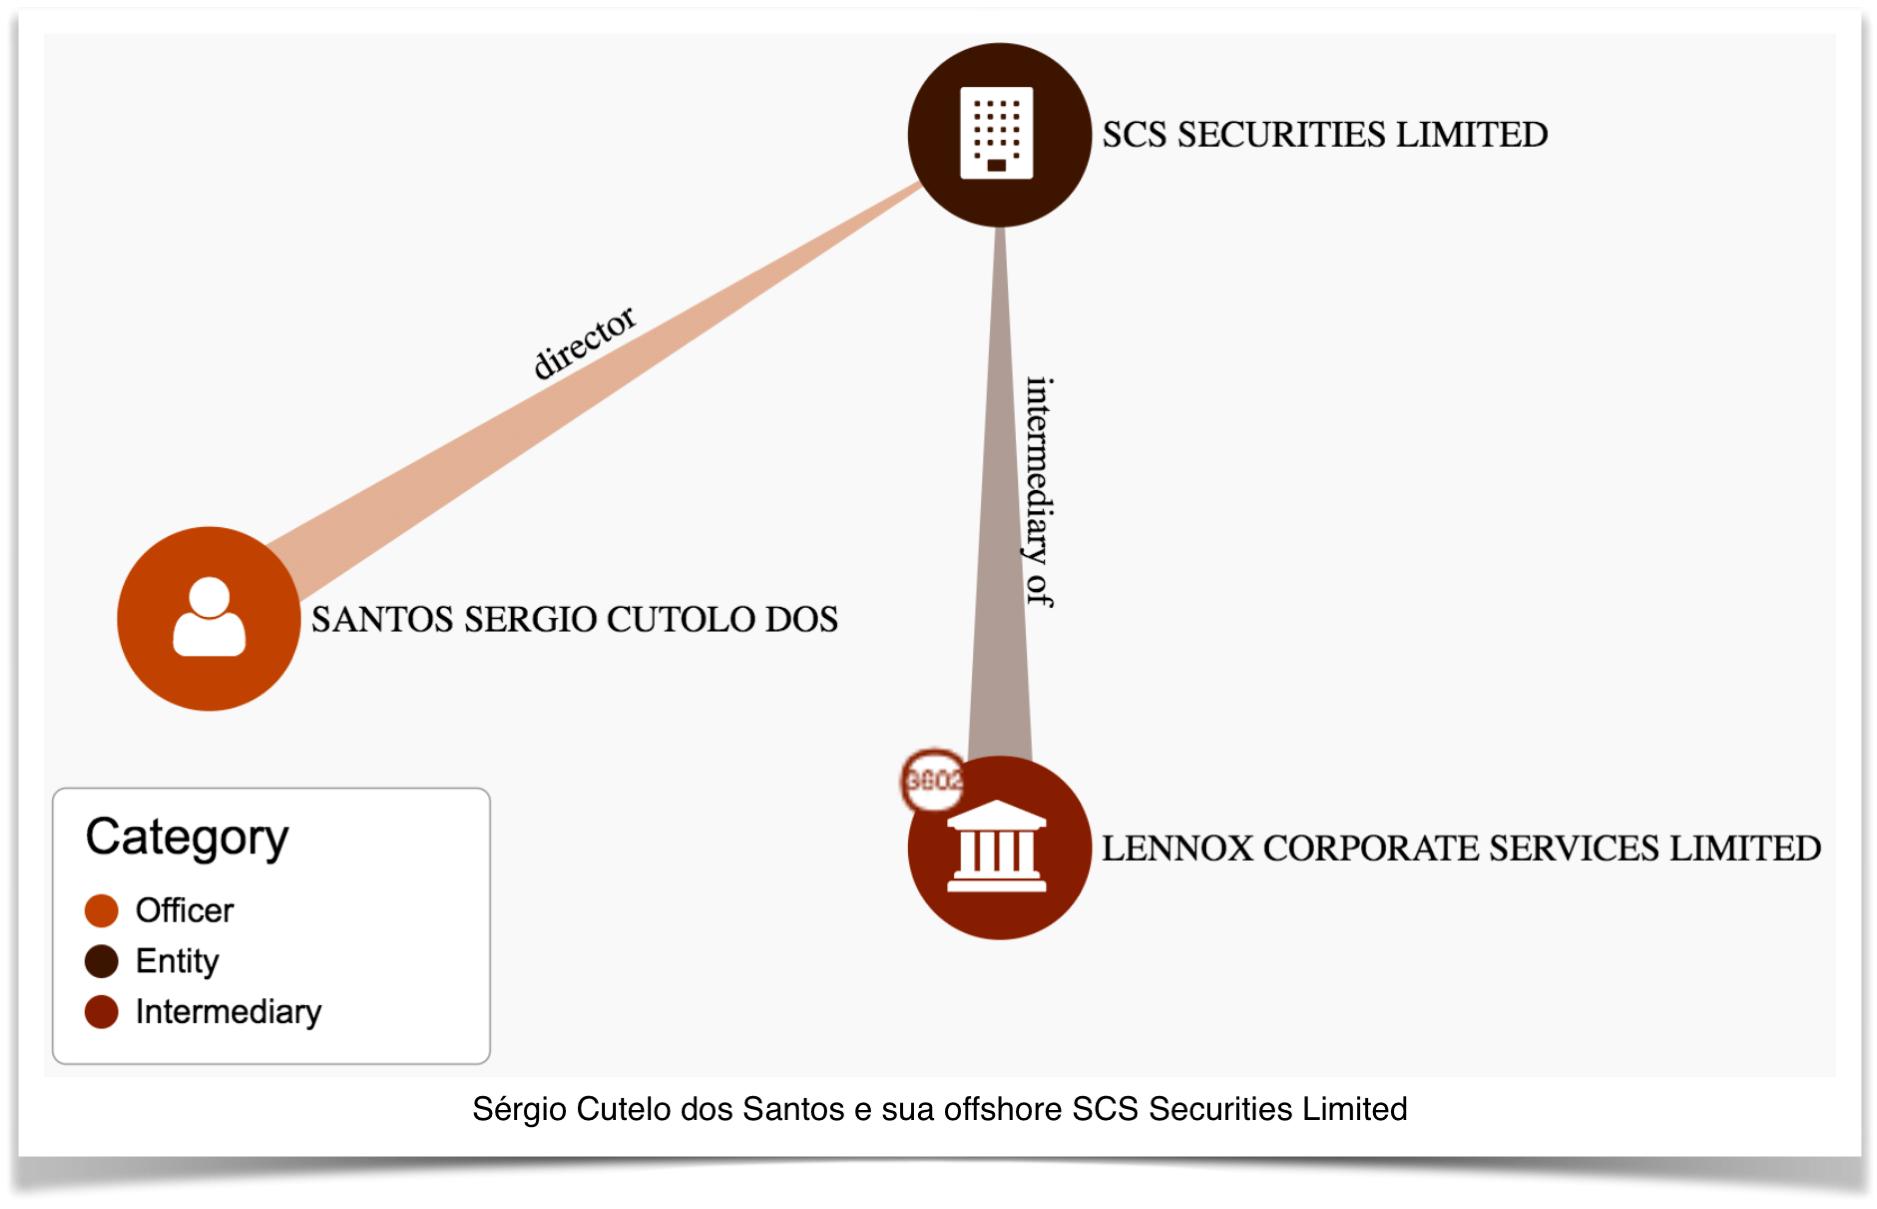 cutolo-scs-securities